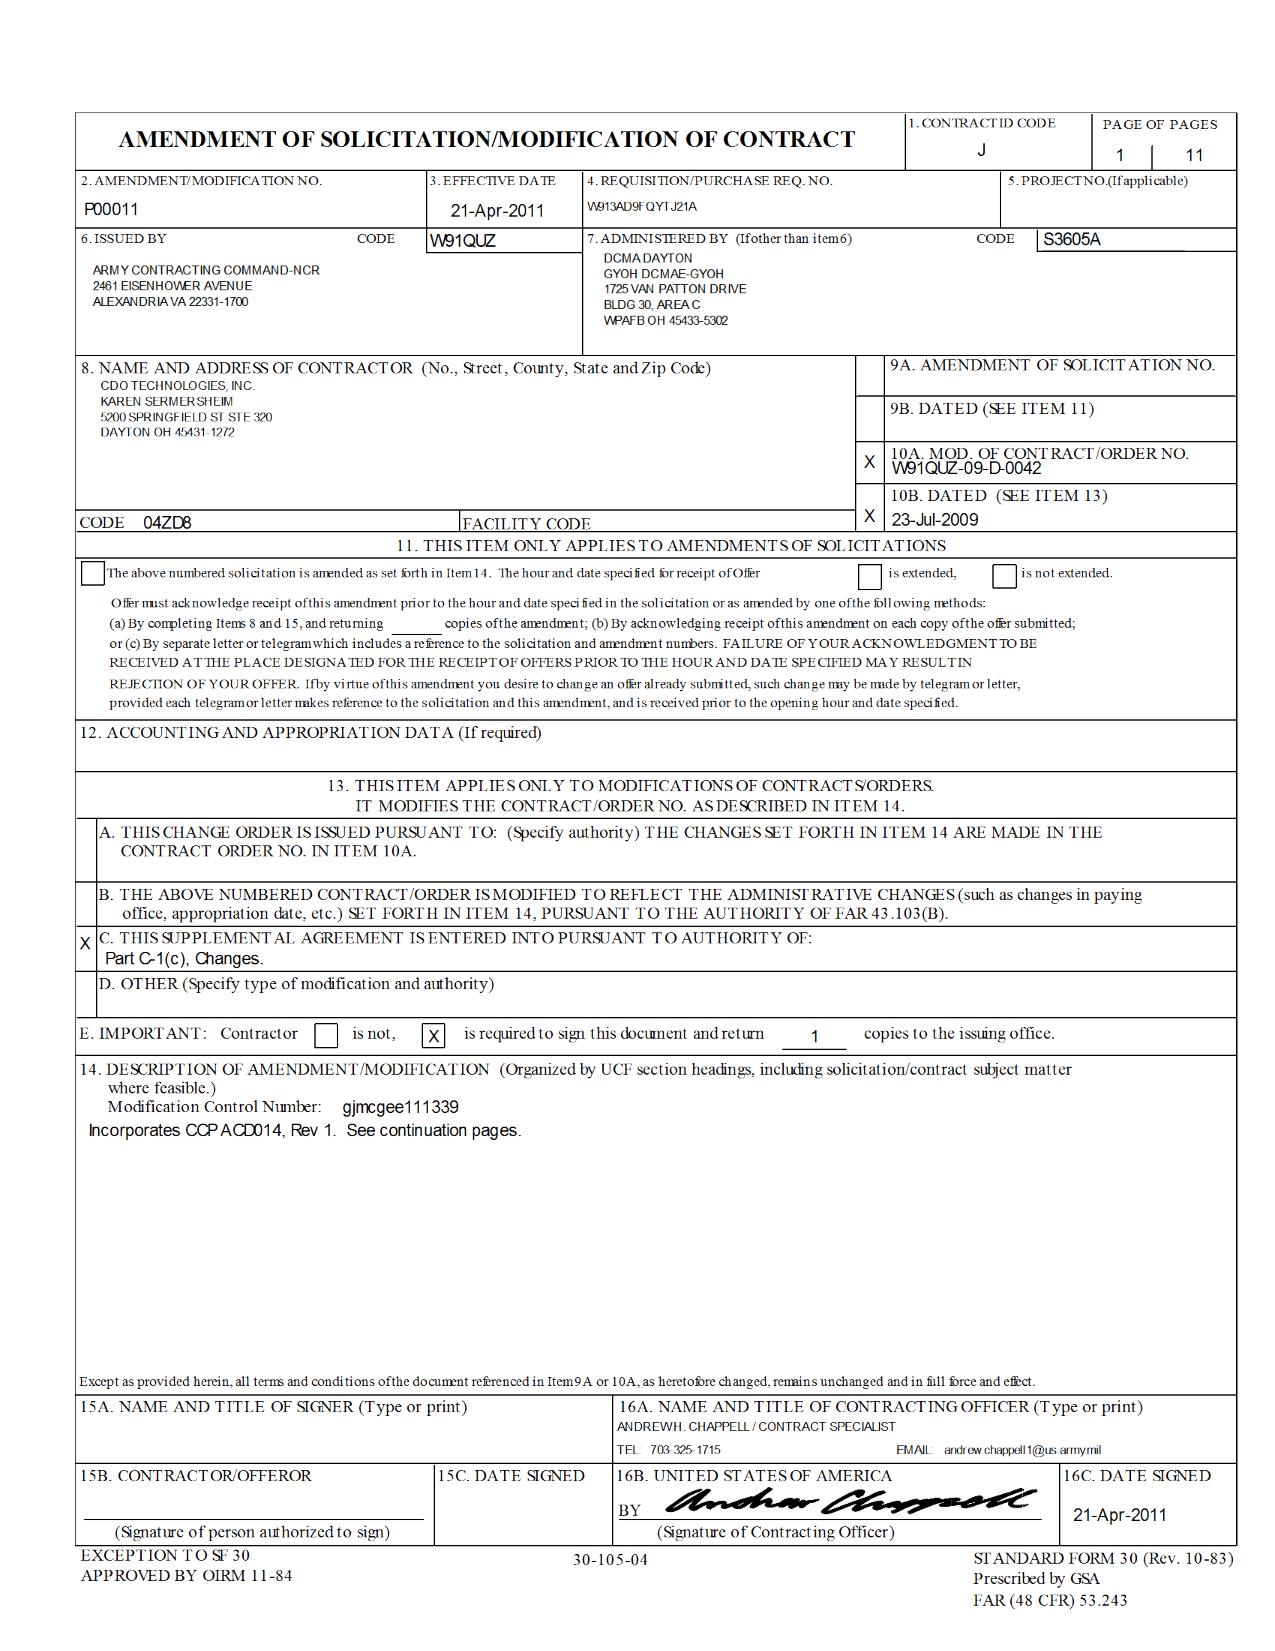 pdf for LaCie Storage 301290 manual